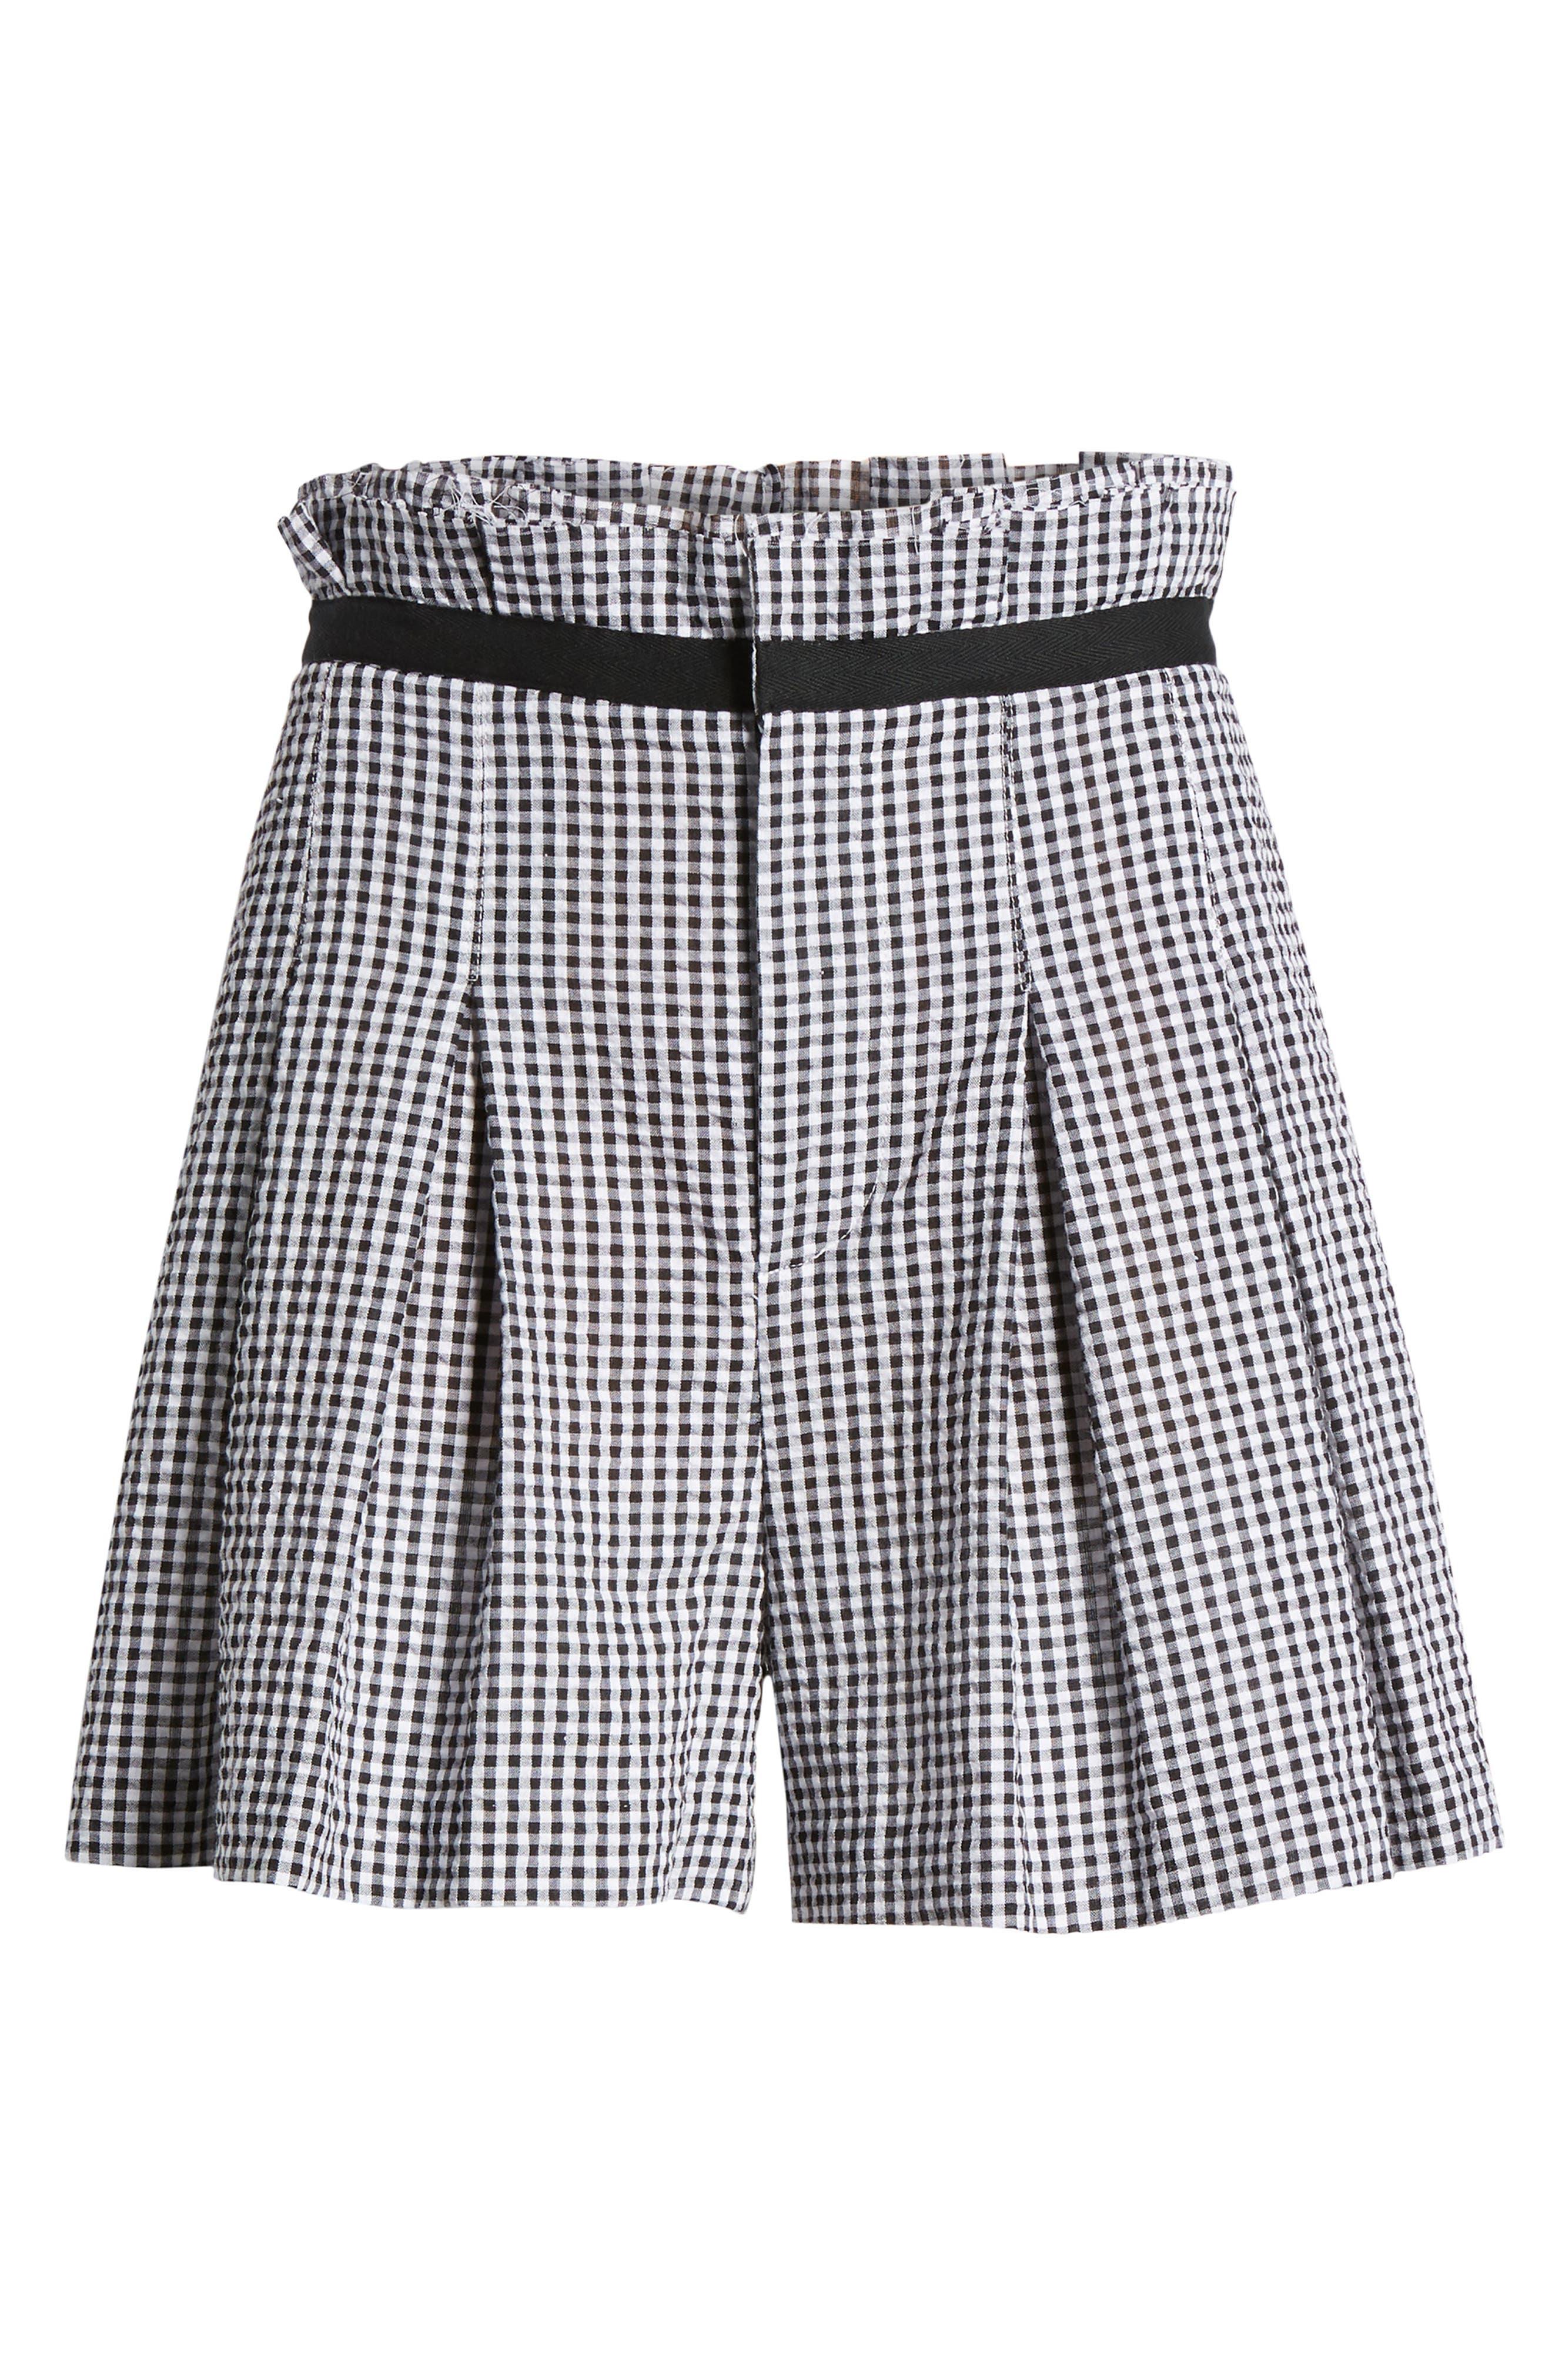 Gingham Paperbag Shorts,                             Alternate thumbnail 6, color,